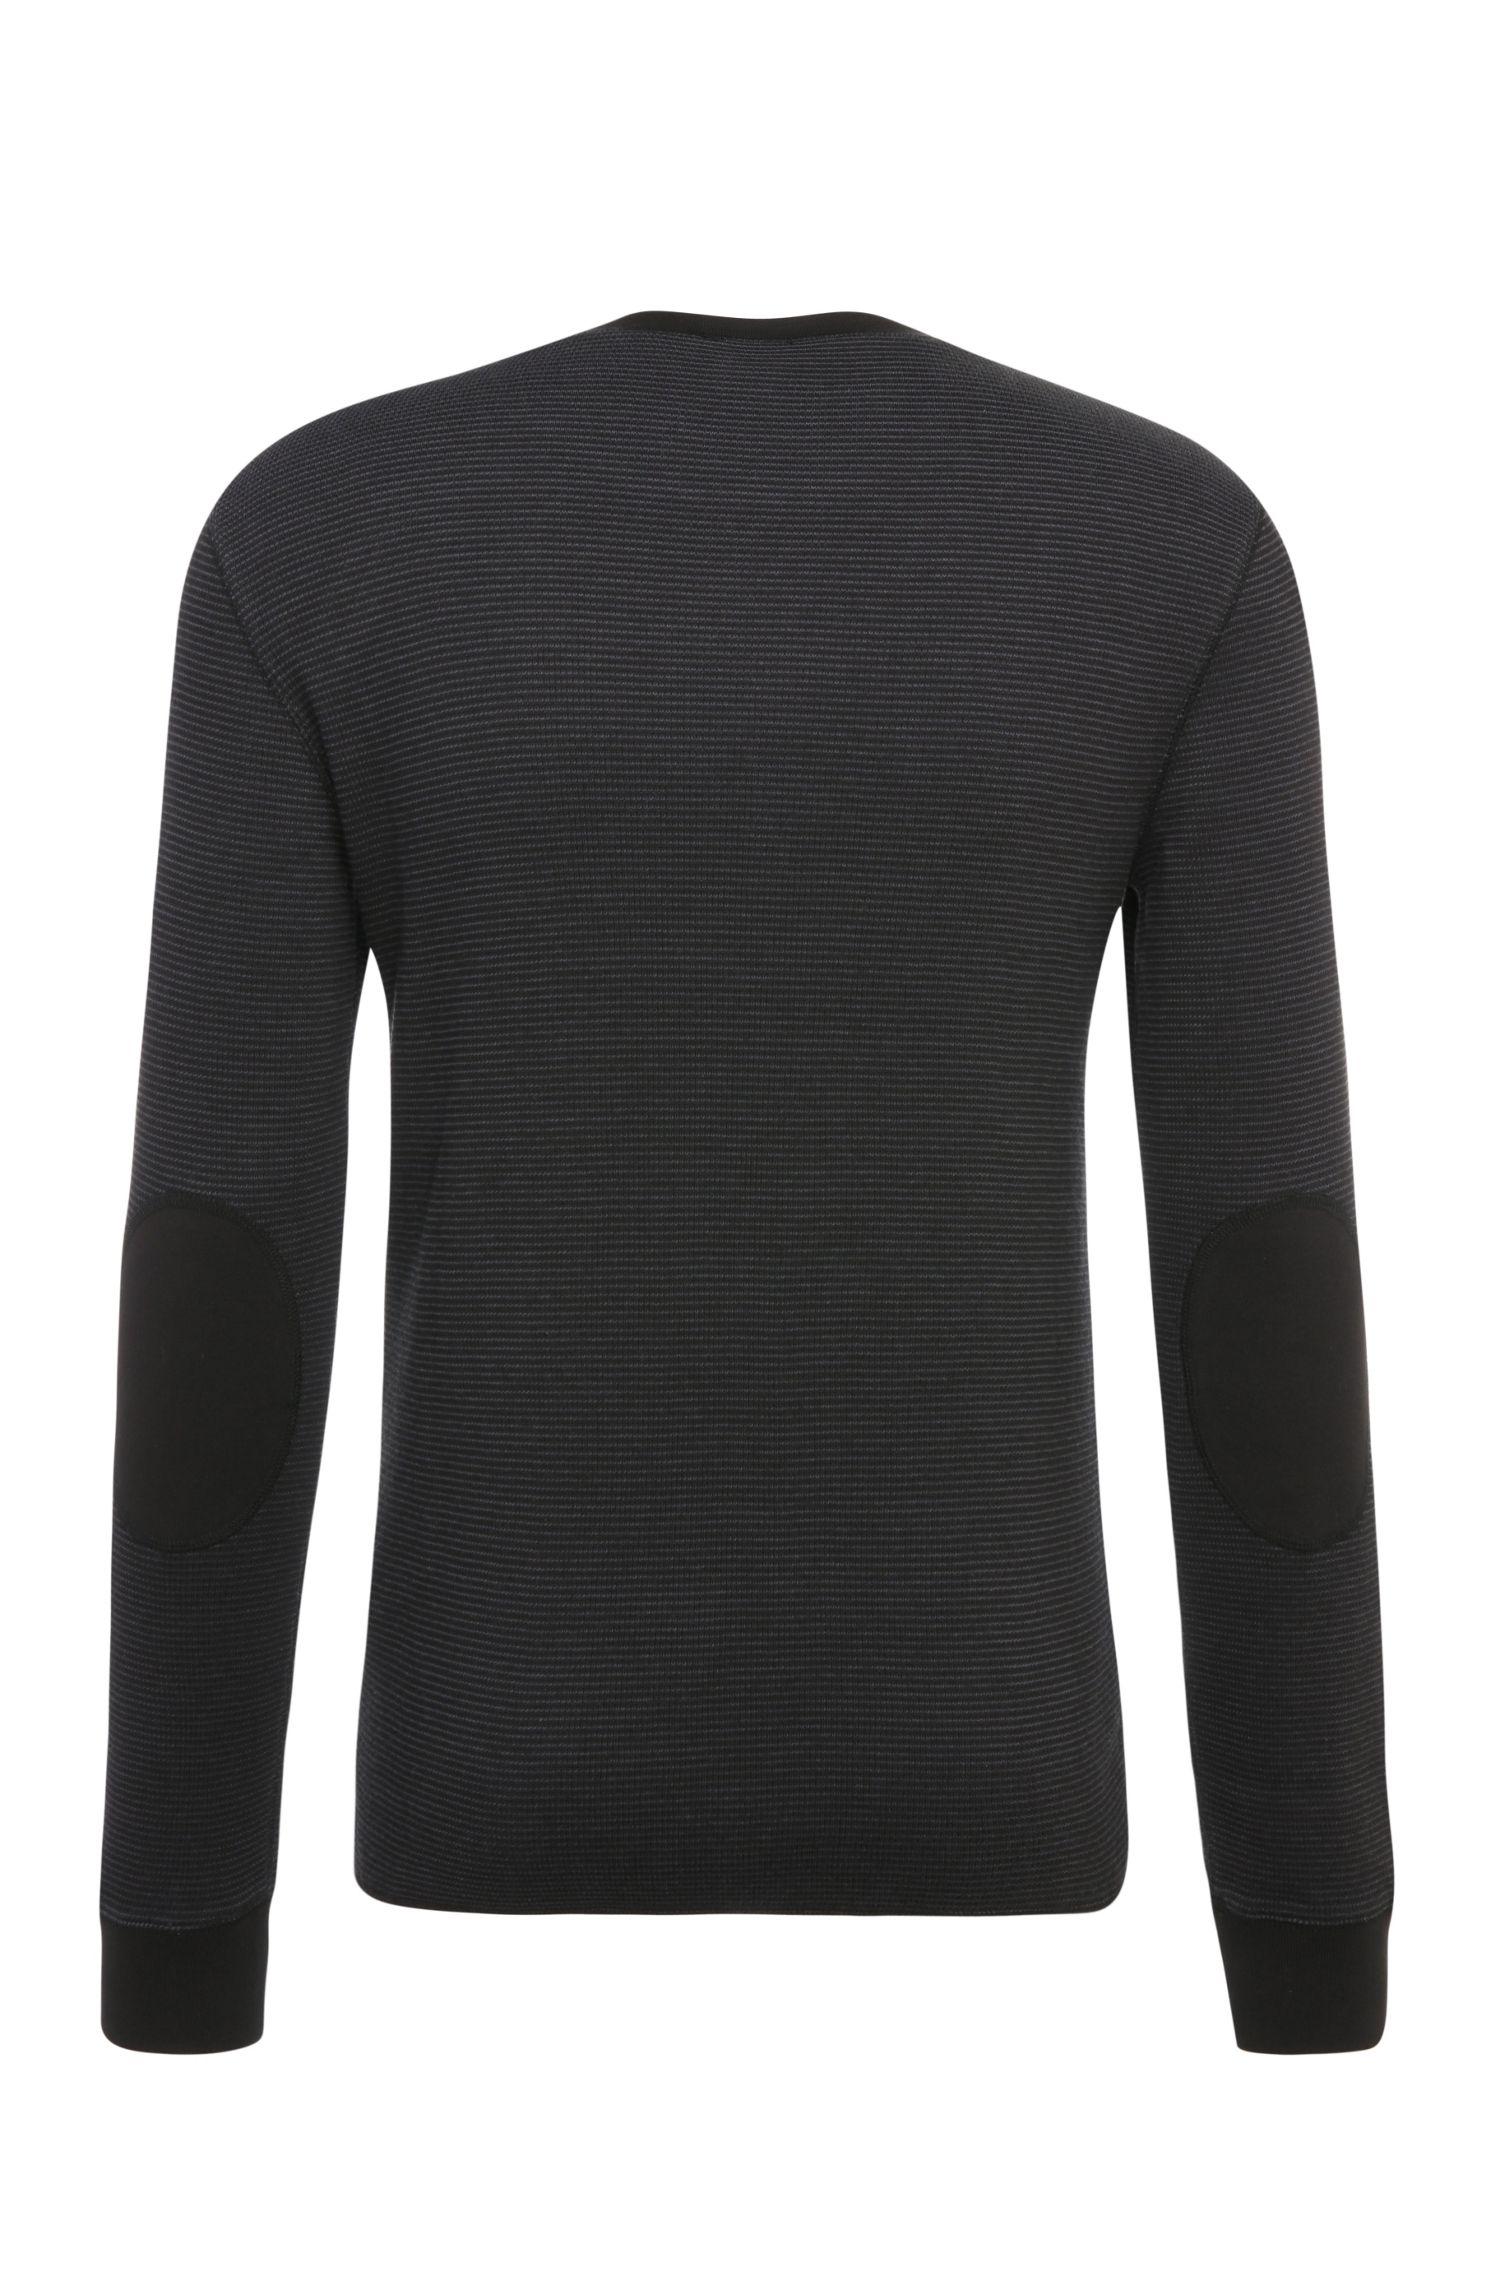 Lichte slim-fit trui van katoen: 'Wot'